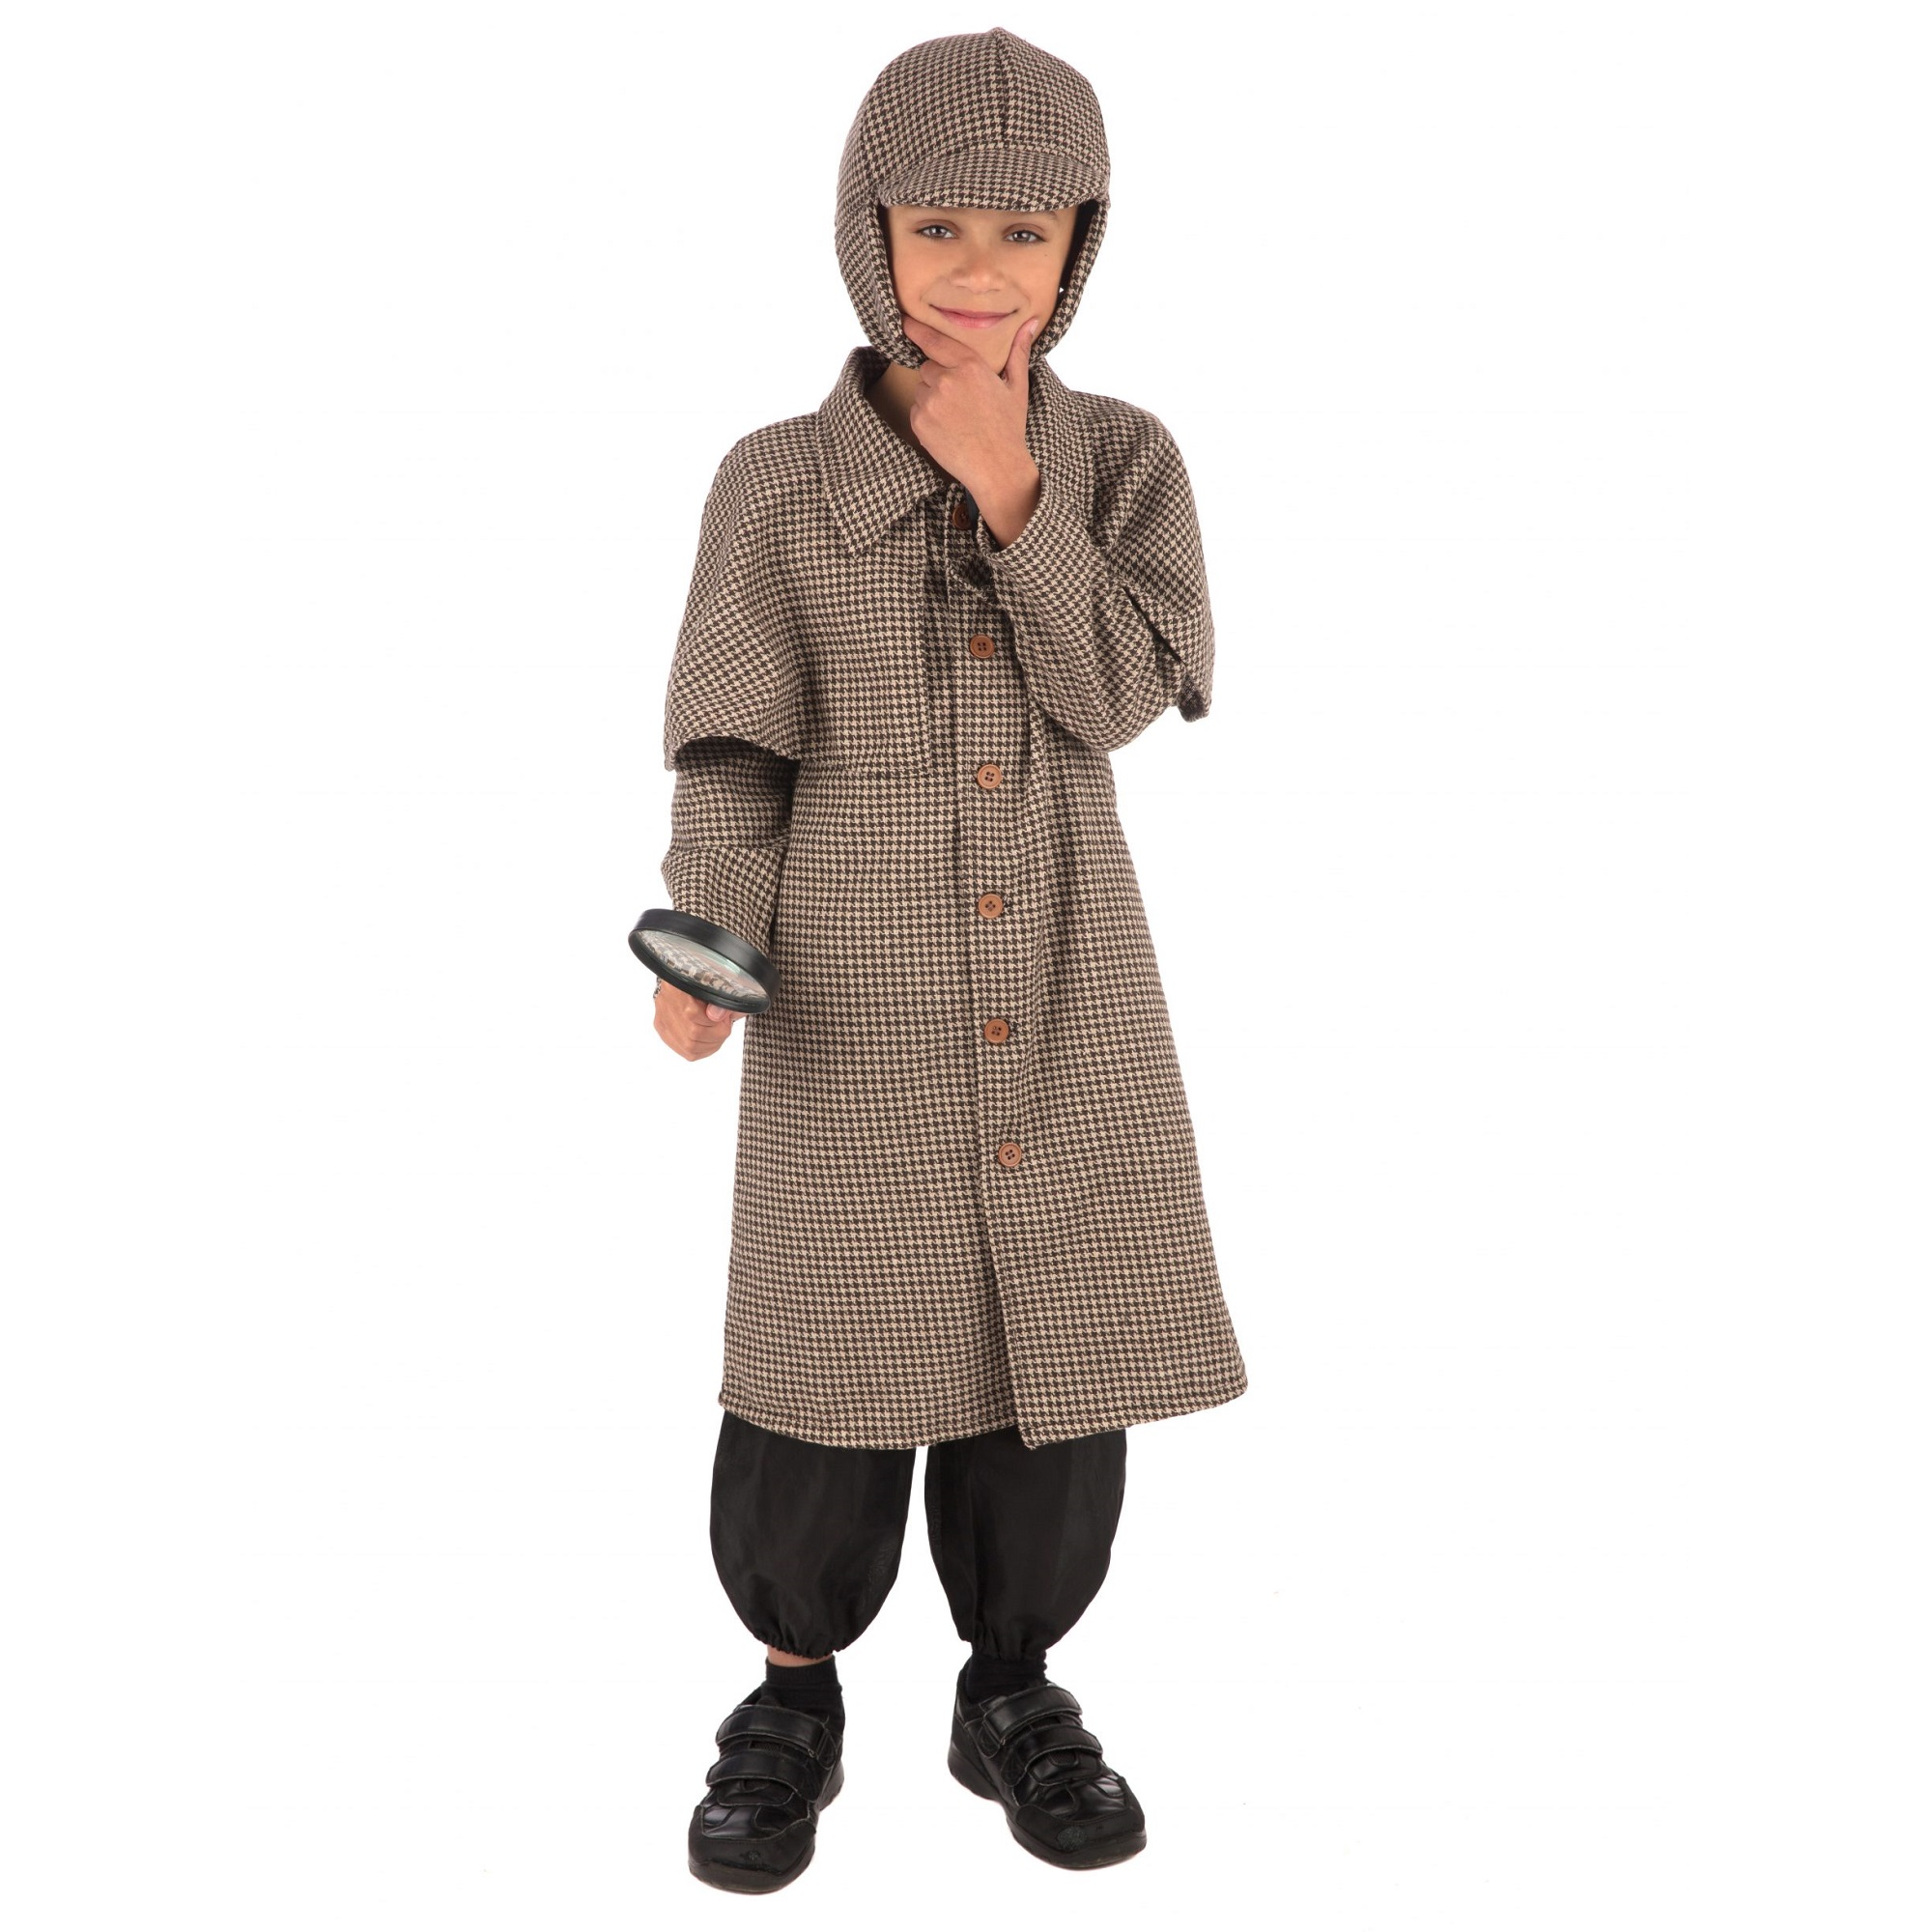 Bristol Novelty Boys Long Detective Coat Costume (S) (Brown)